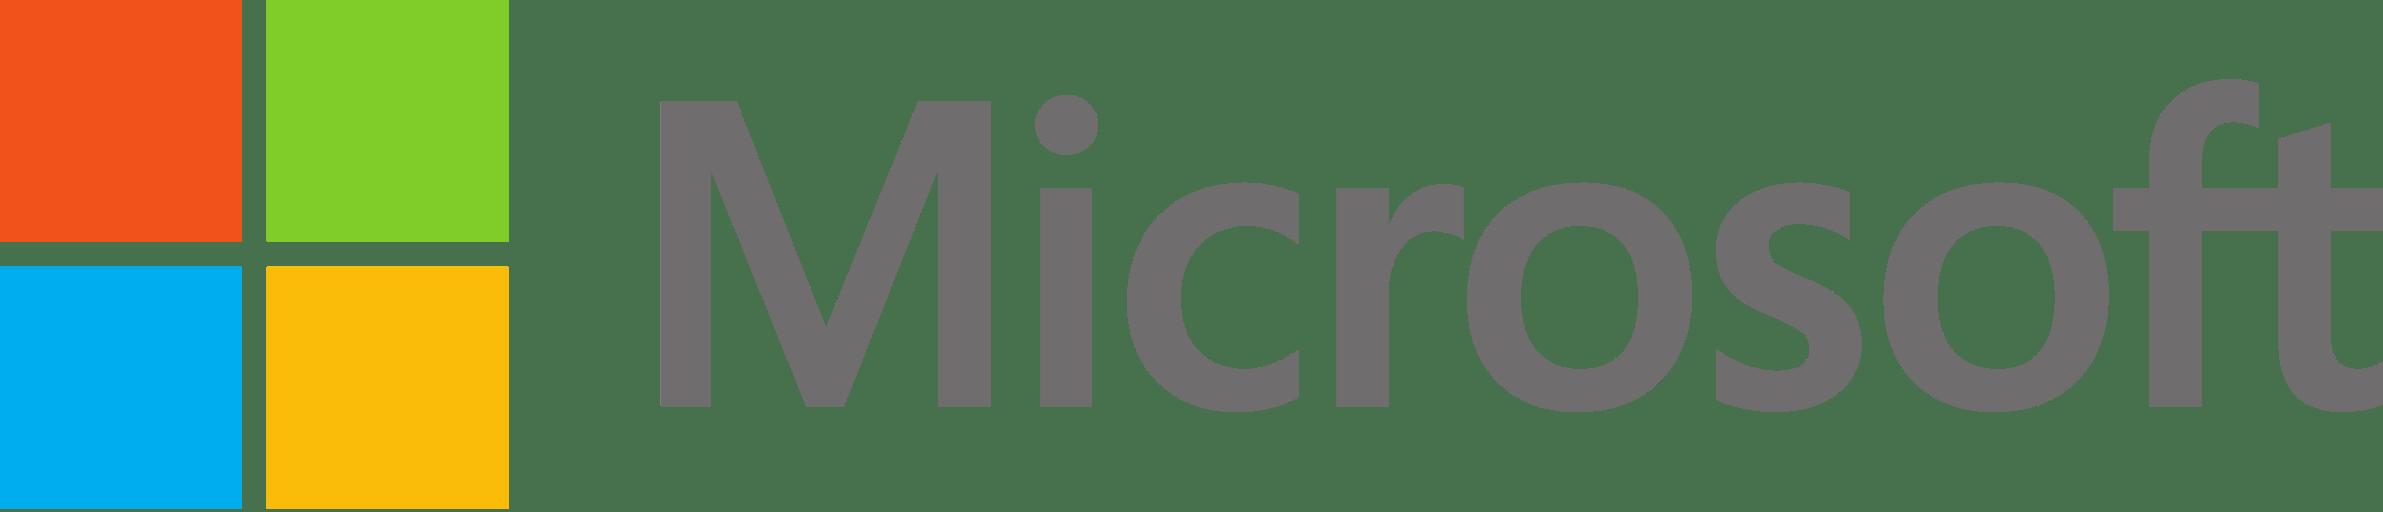 Microsoft logo .png